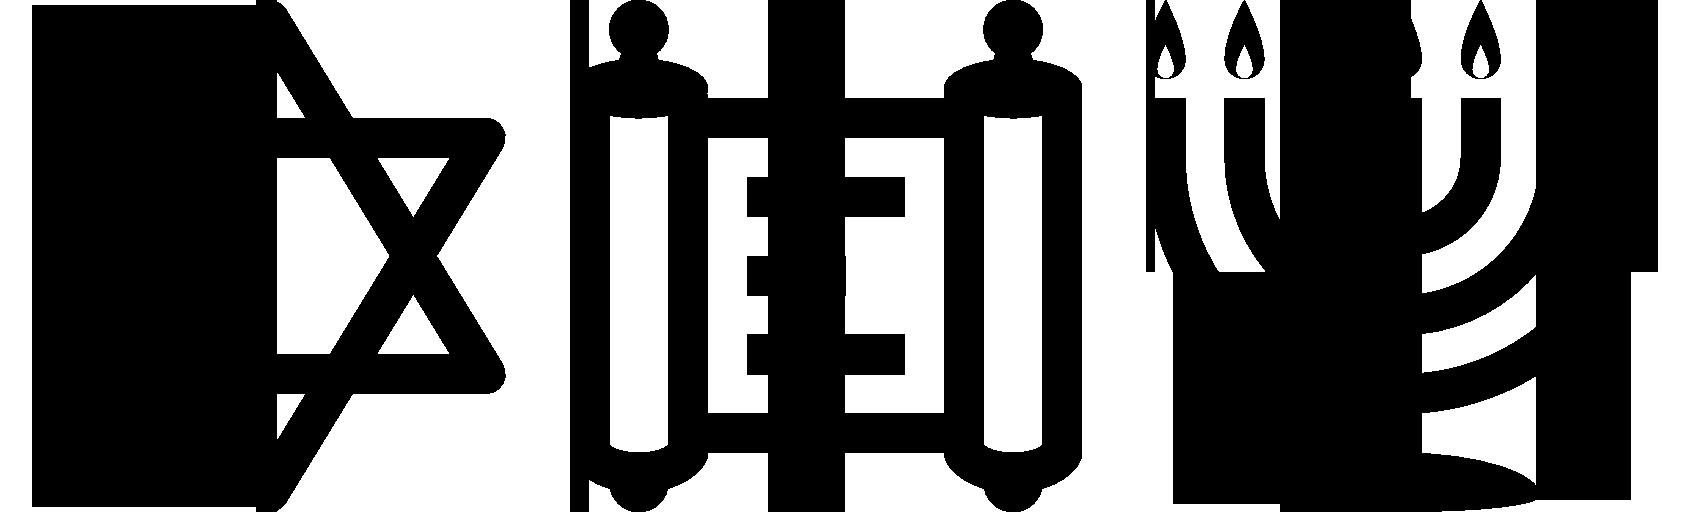 star of david, torah and menorah icons